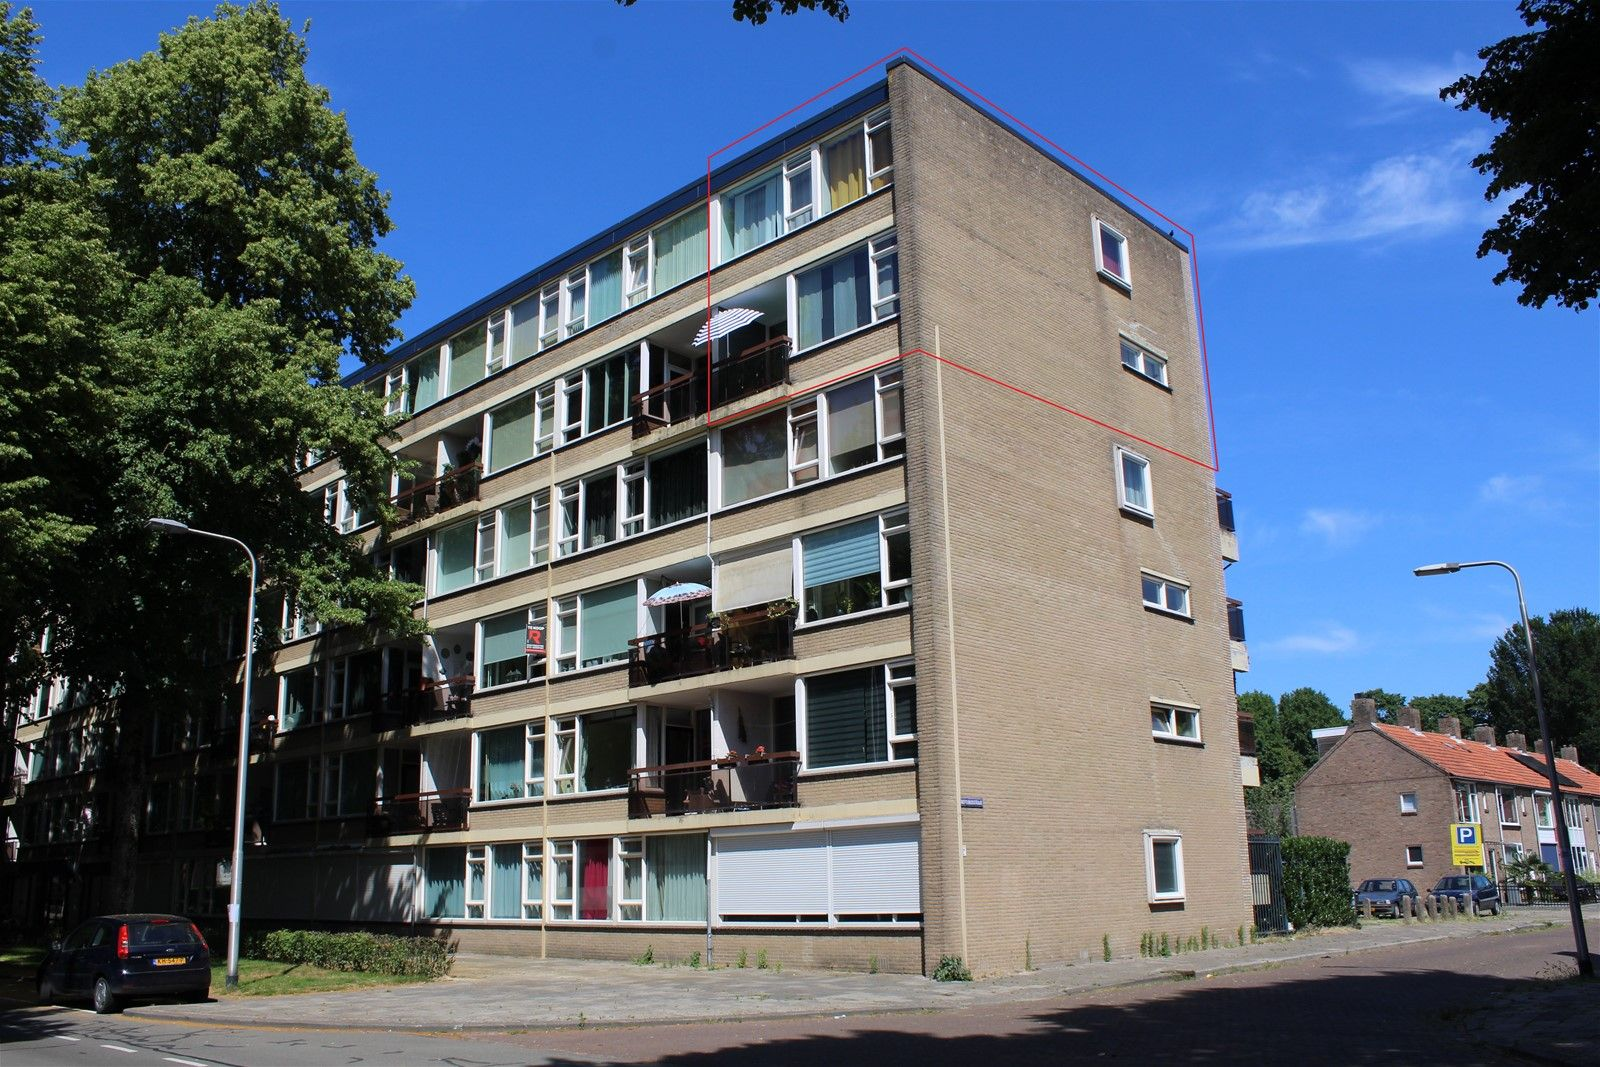 Postelse Hoeflaan 58, Tilburg